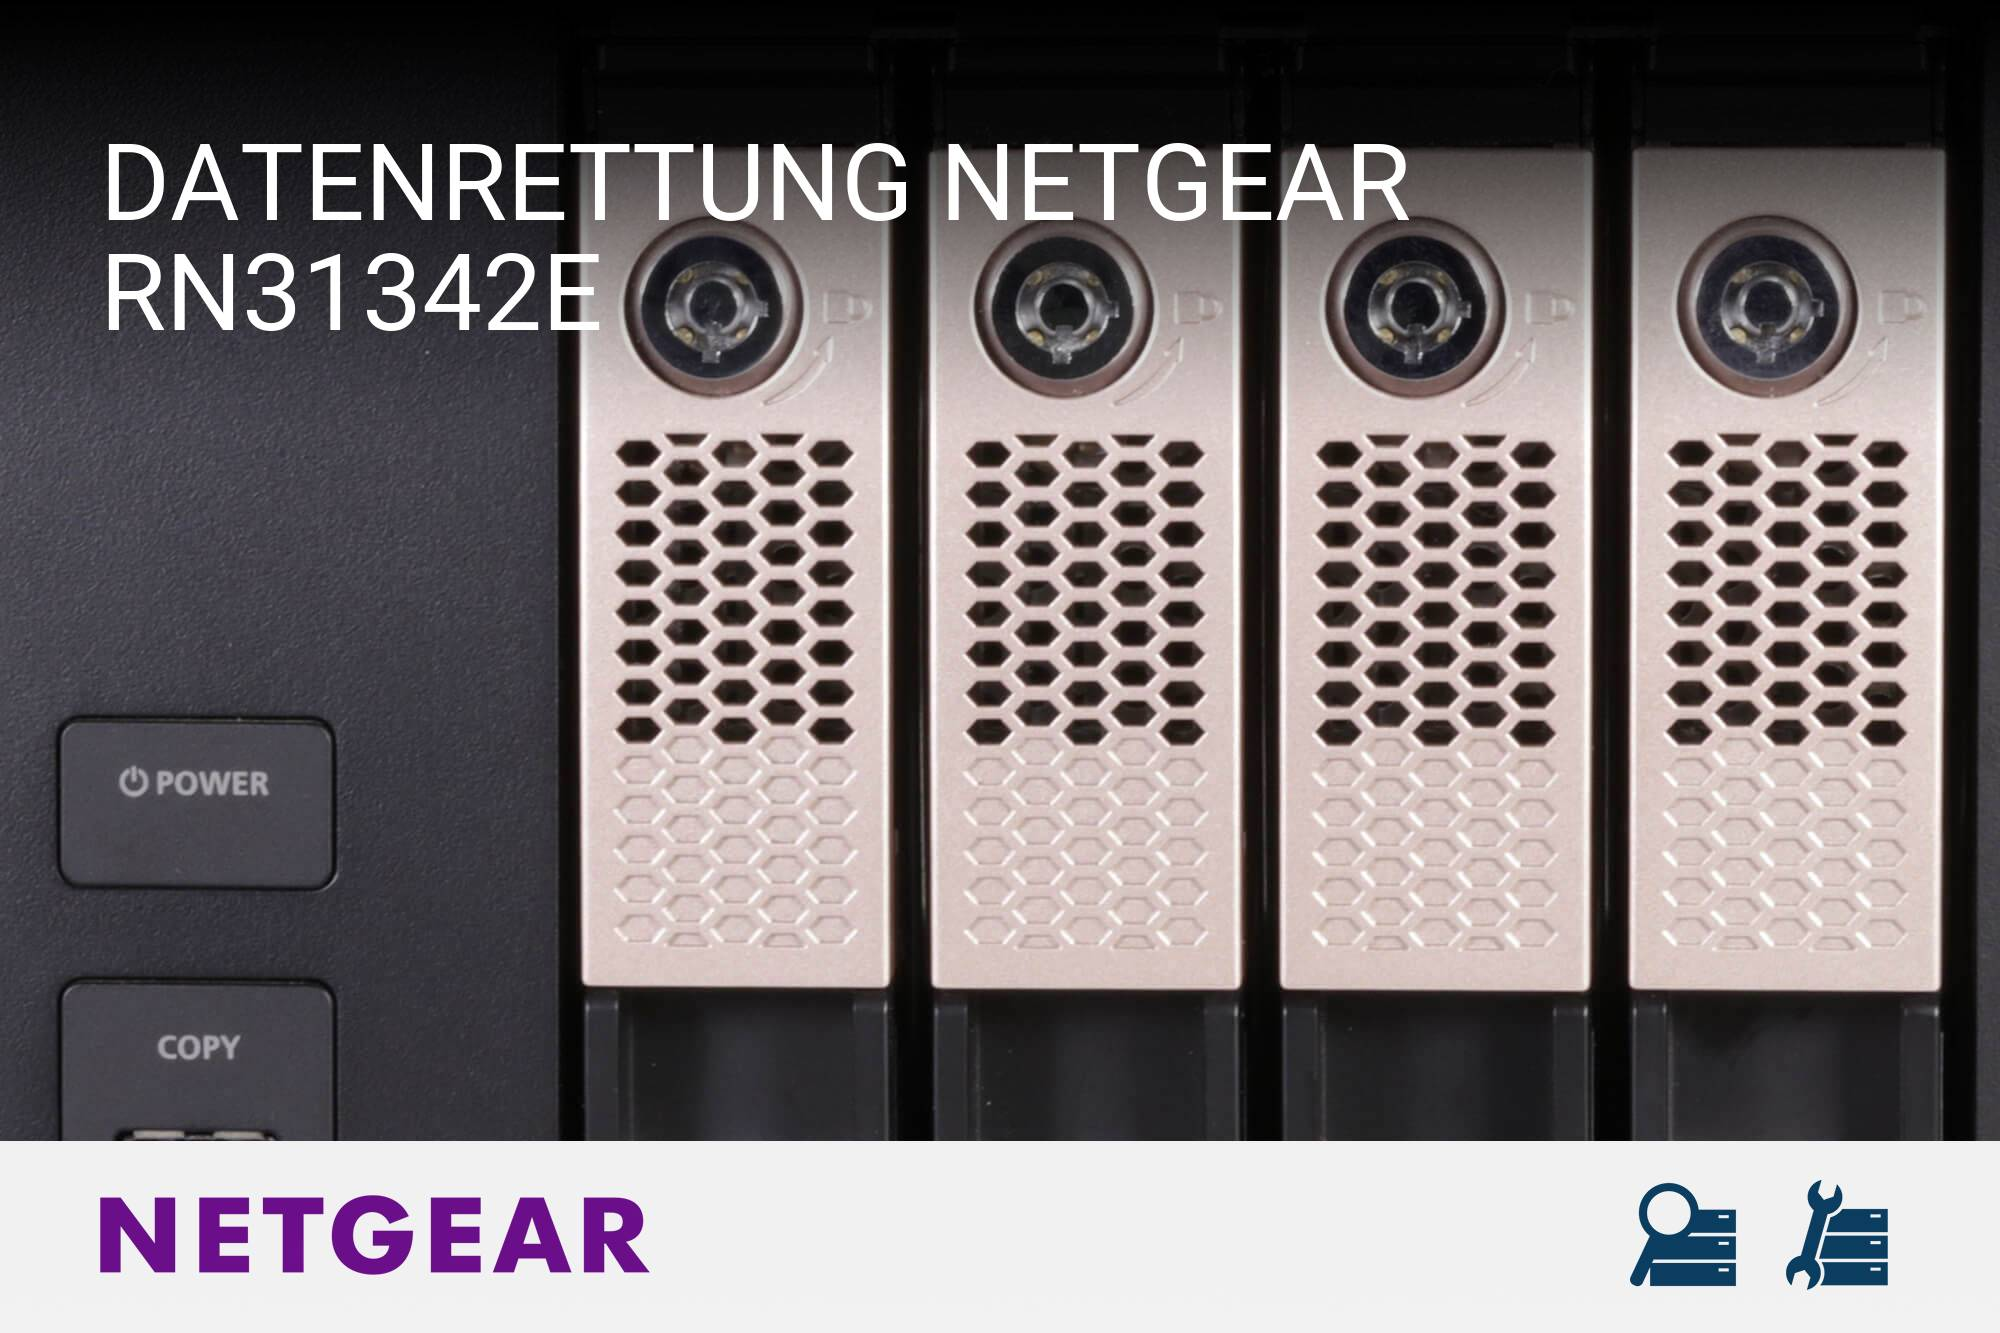 Netgear RN31342E